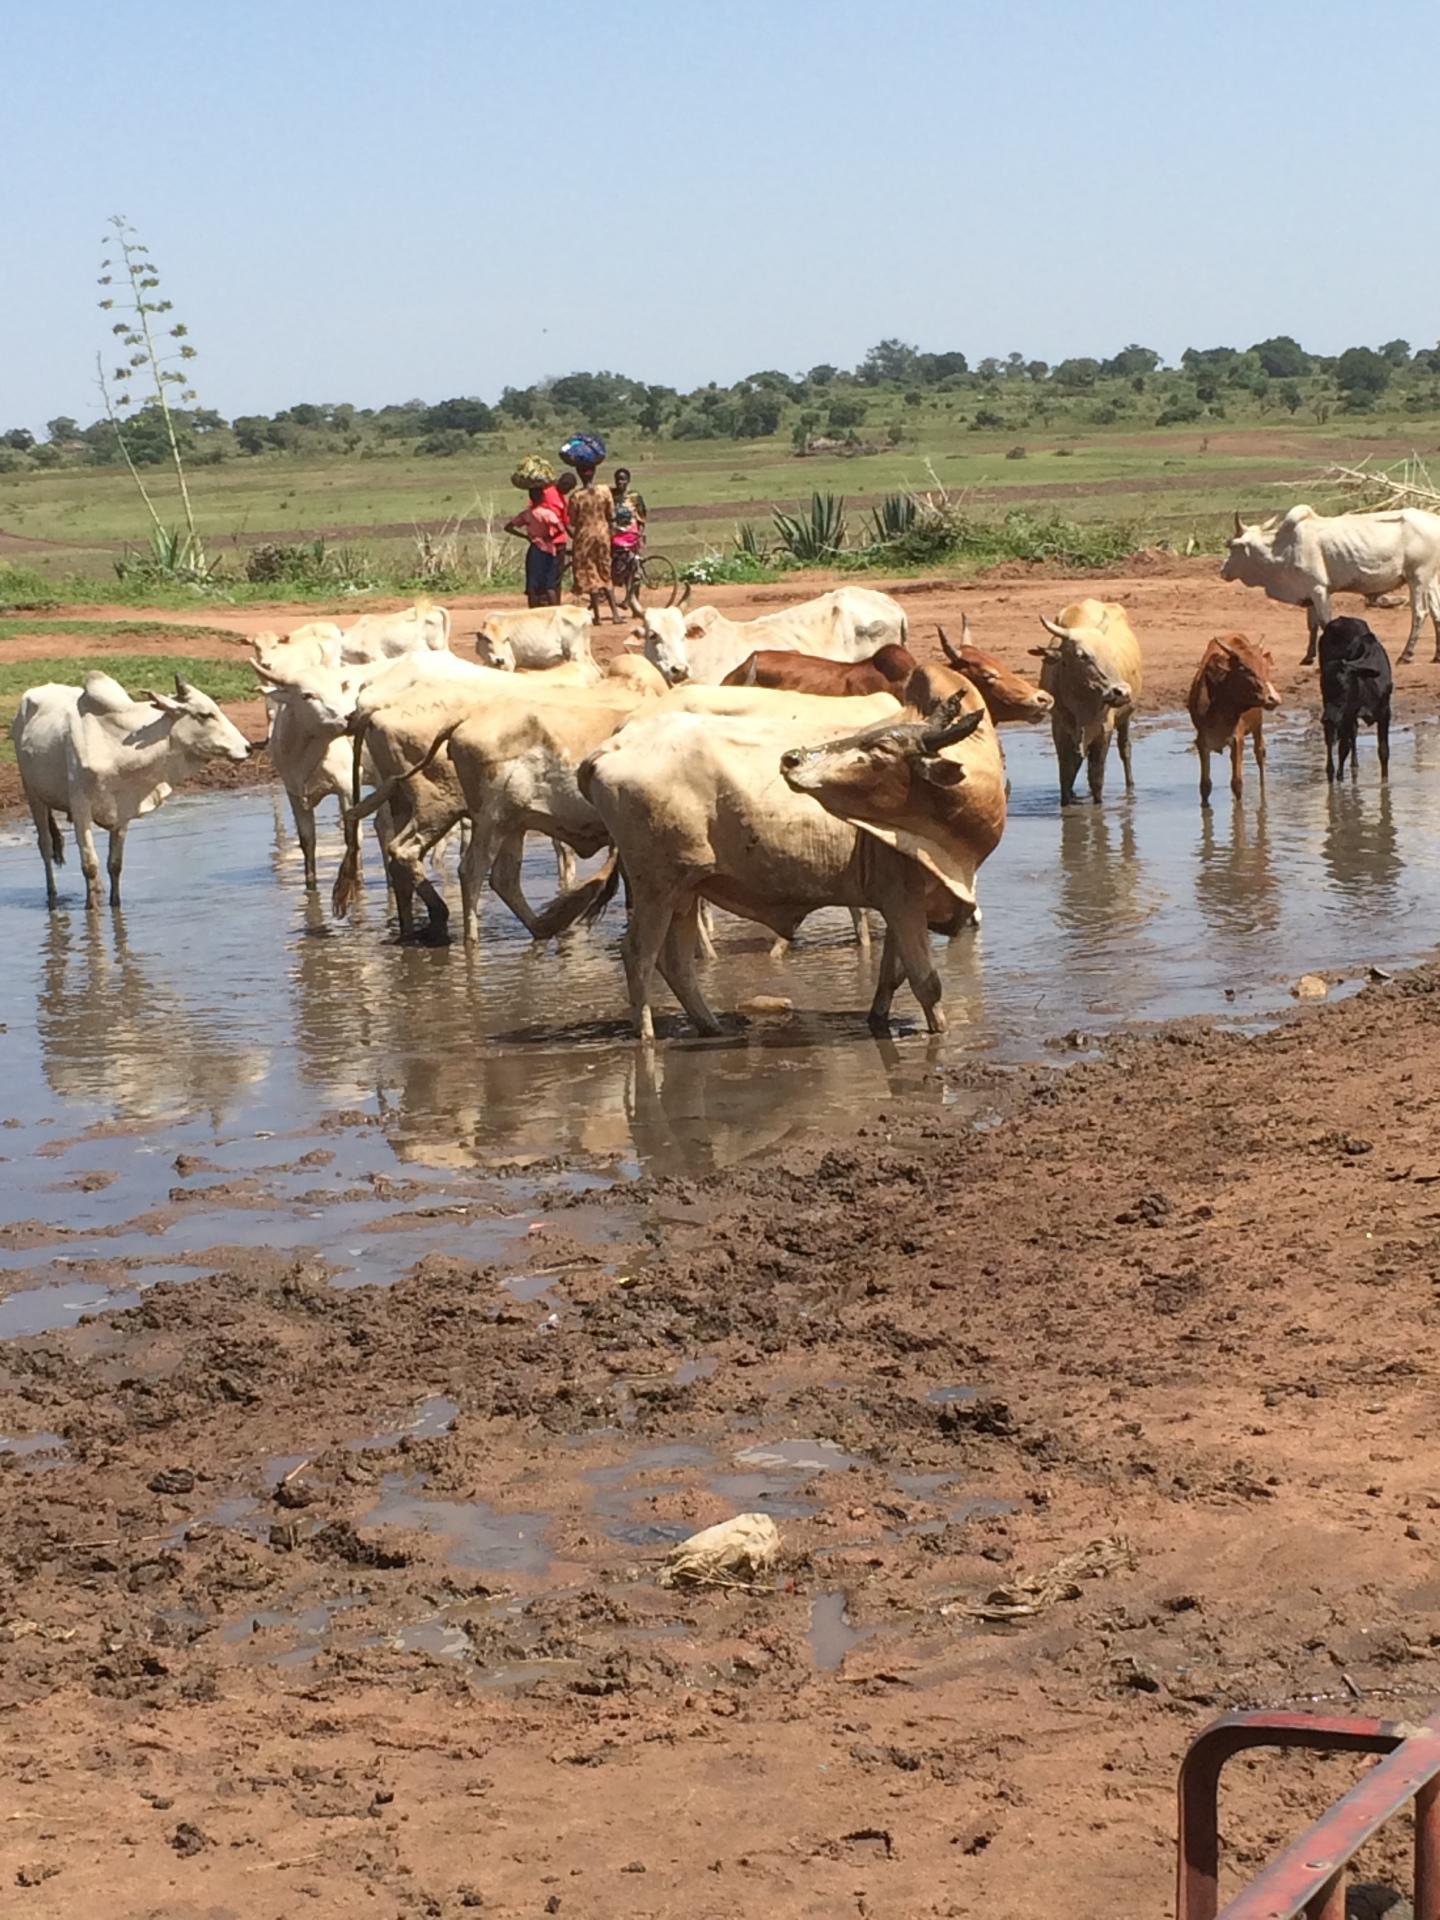 Water, Sanitation, and Education